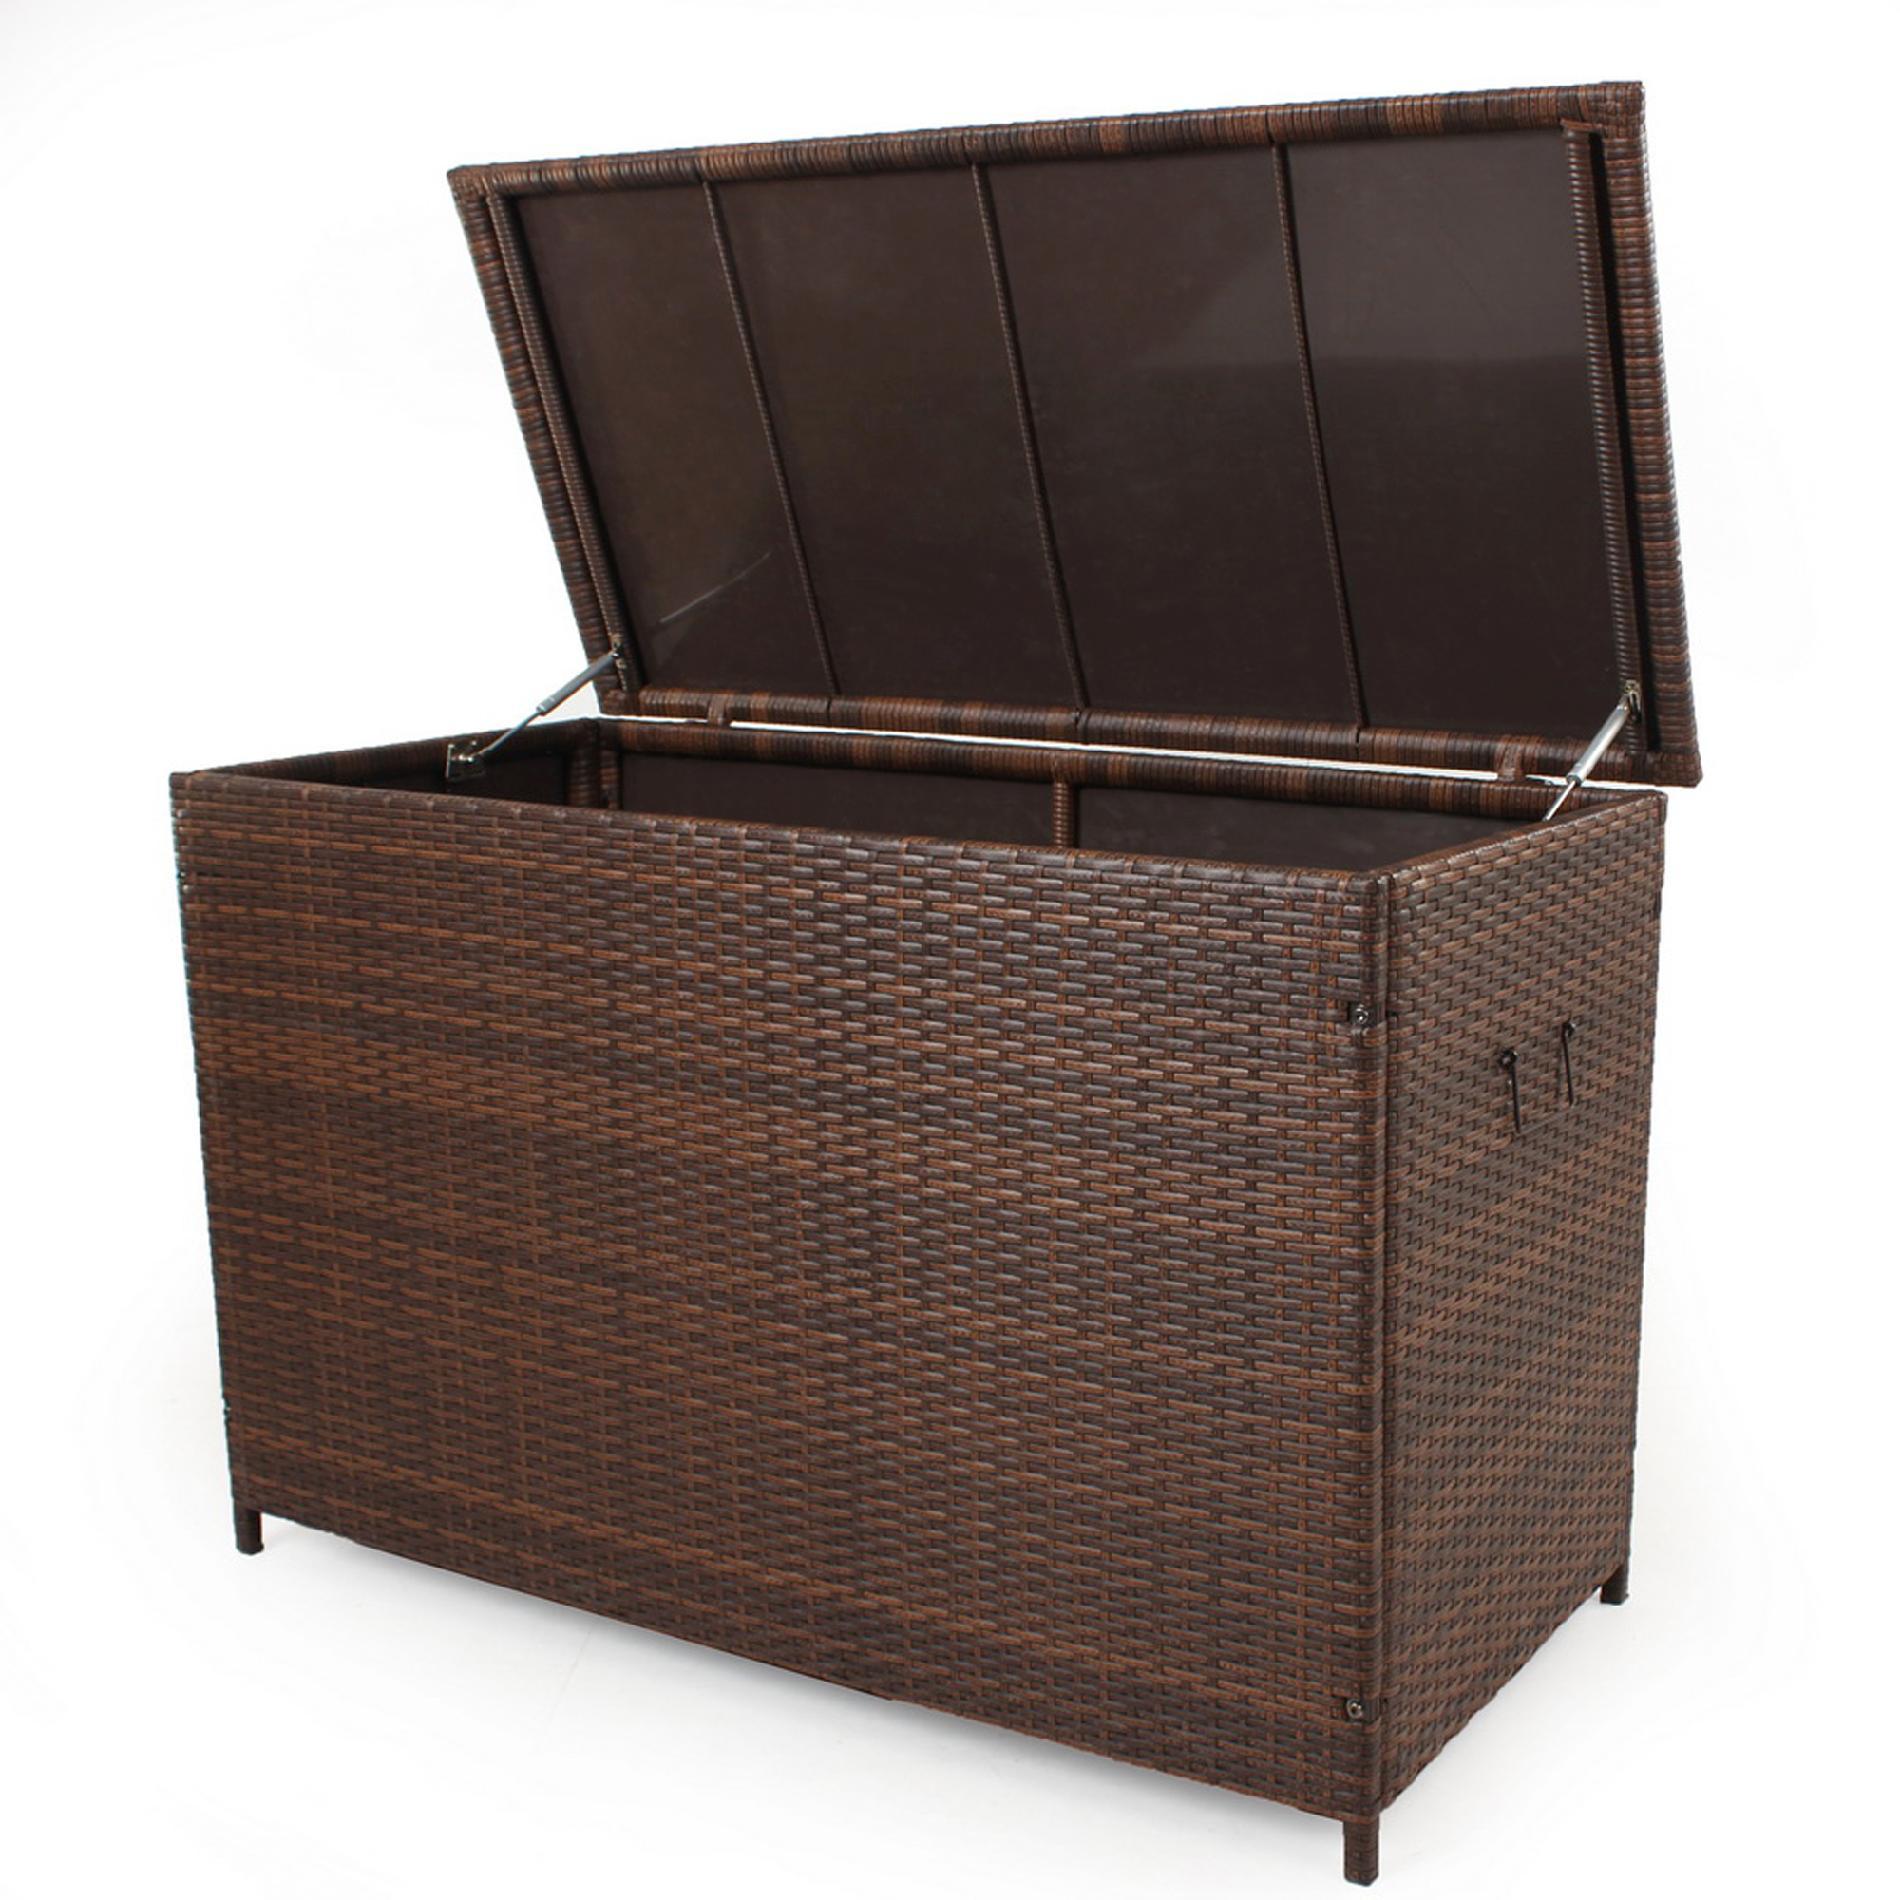 Ty Pennington Style Mayfield Storage Box Limited